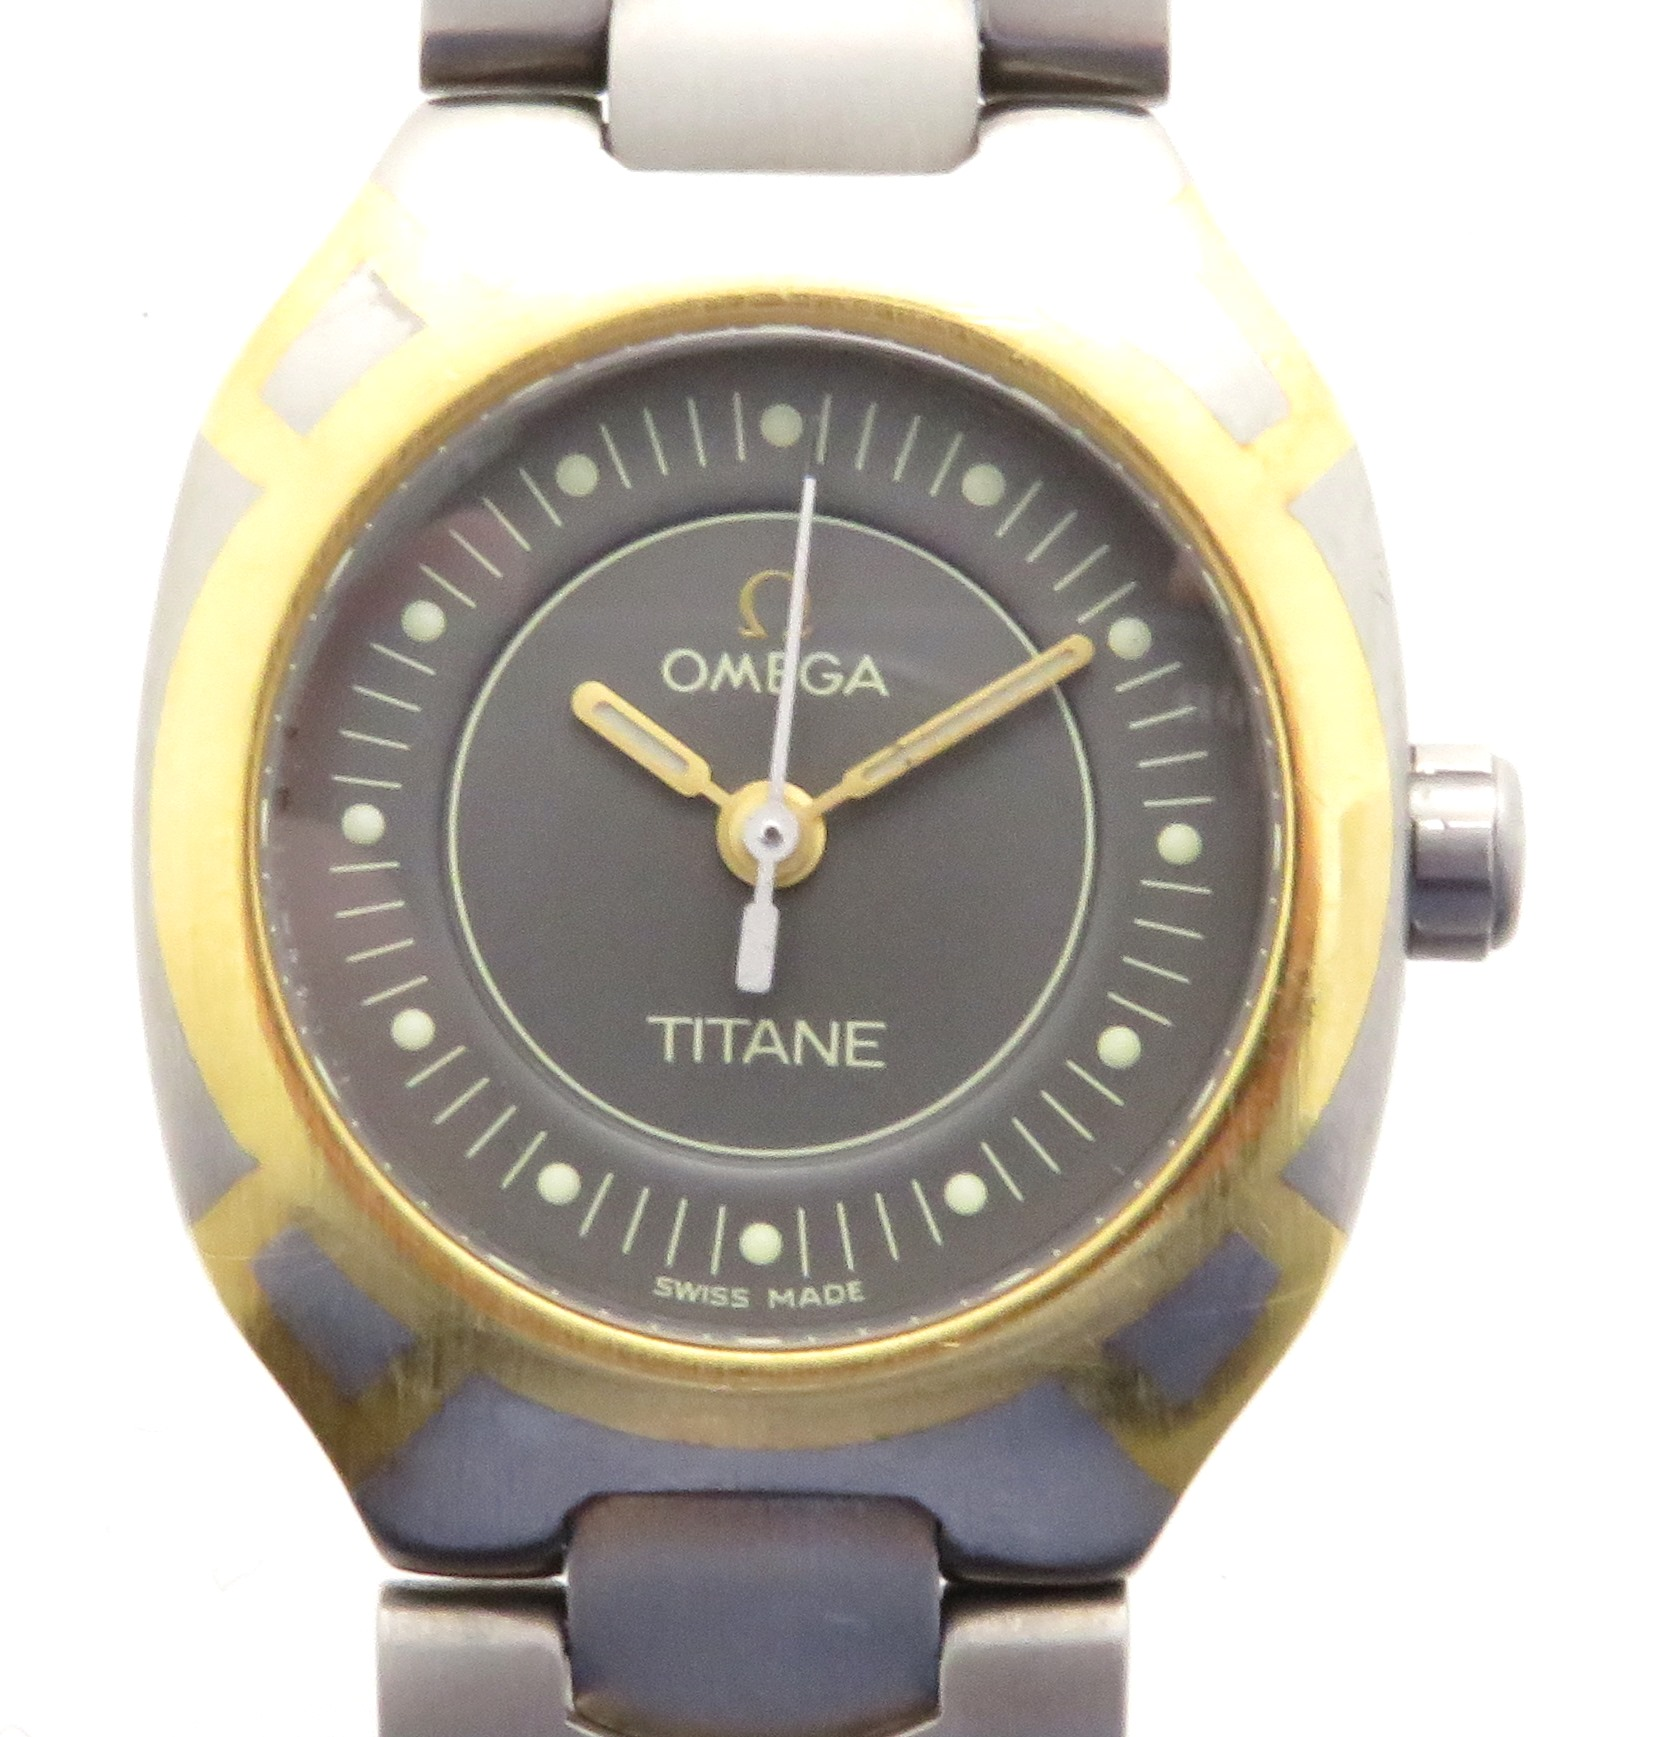 OMEGA オメガ シーマスター・ポラリス チタン クオーツ レディース腕時計 【432】